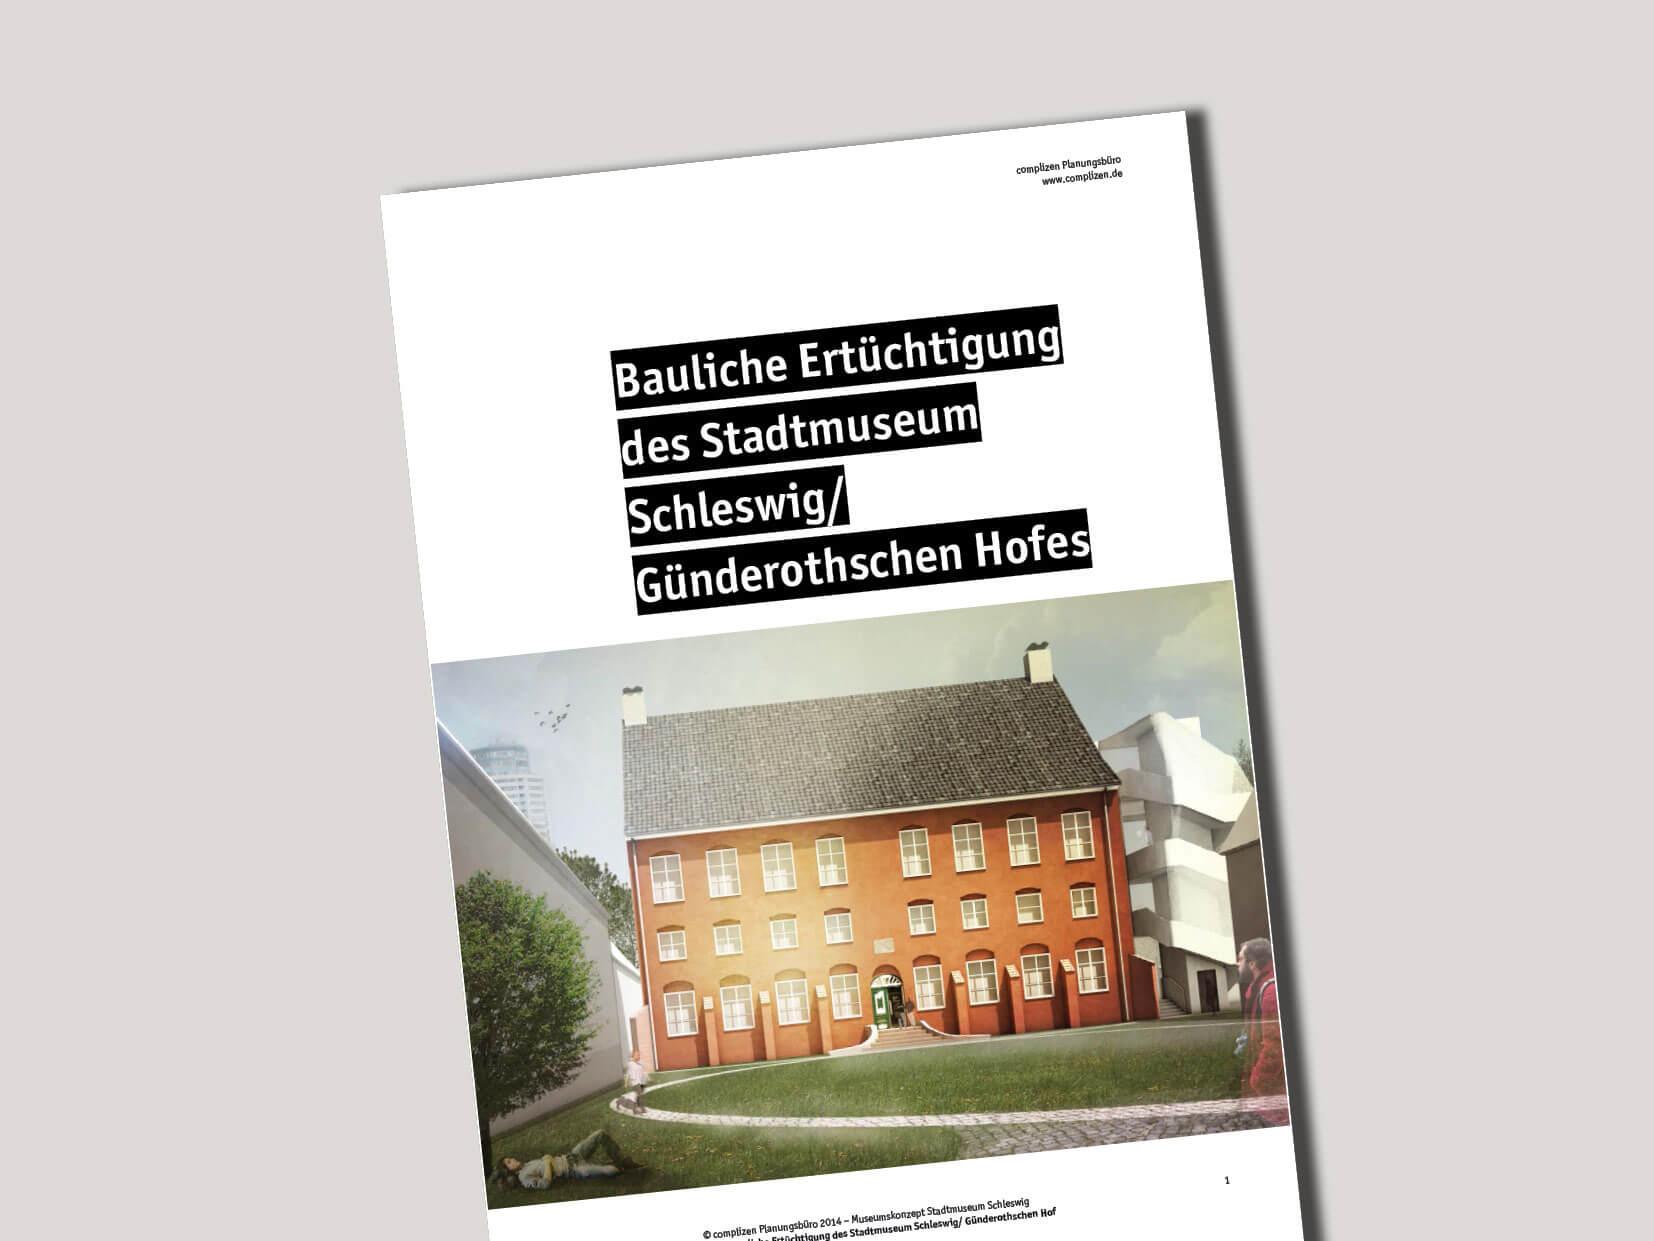 Sanierung Stadtmuseum Schleswig 5 (web)